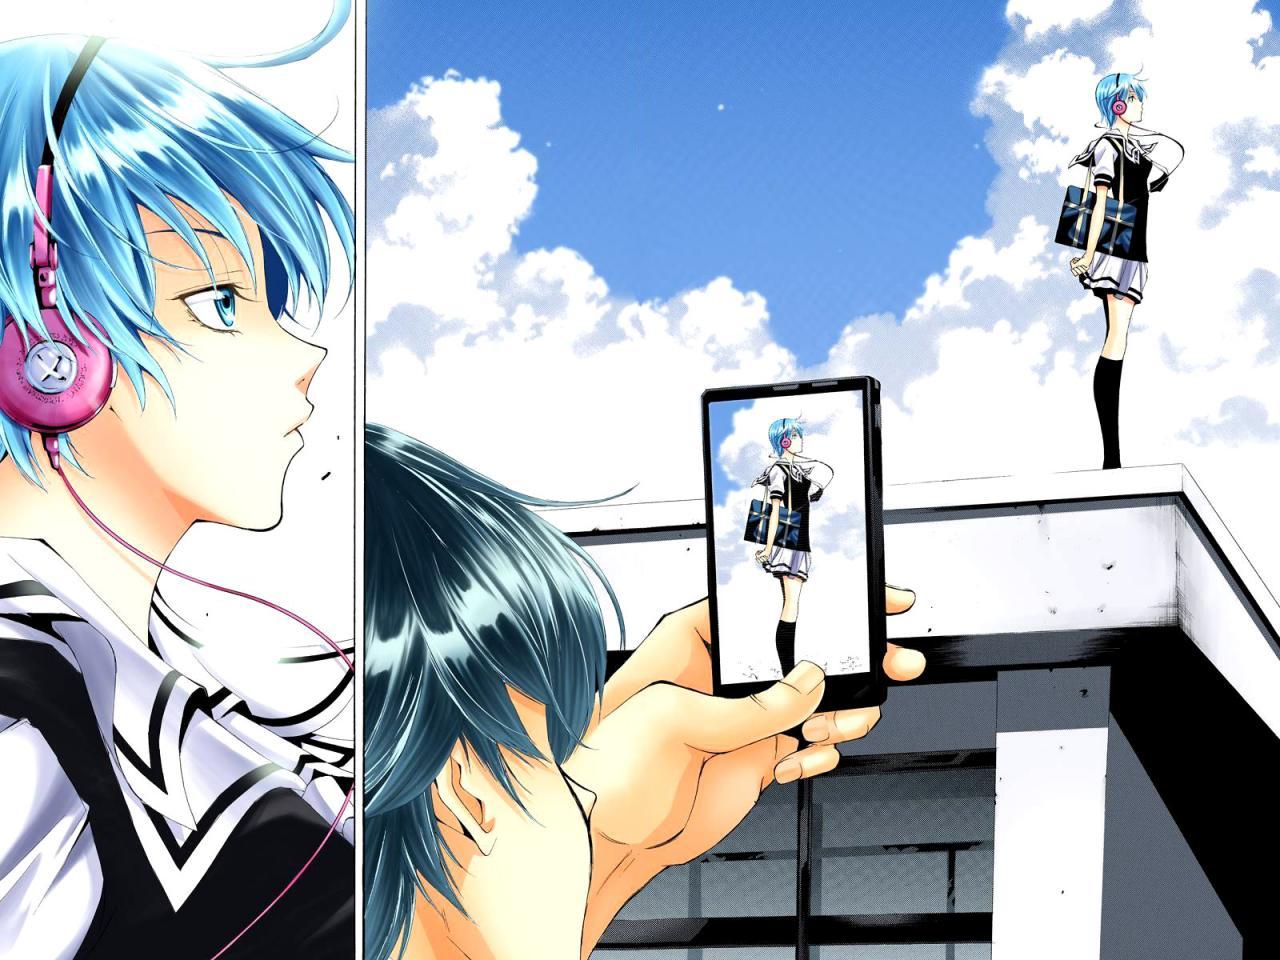 the-5-major-differences-between-the-fuuka-manga-and-anime The 5 Major Differences Between the Fuuka Manga and Anime